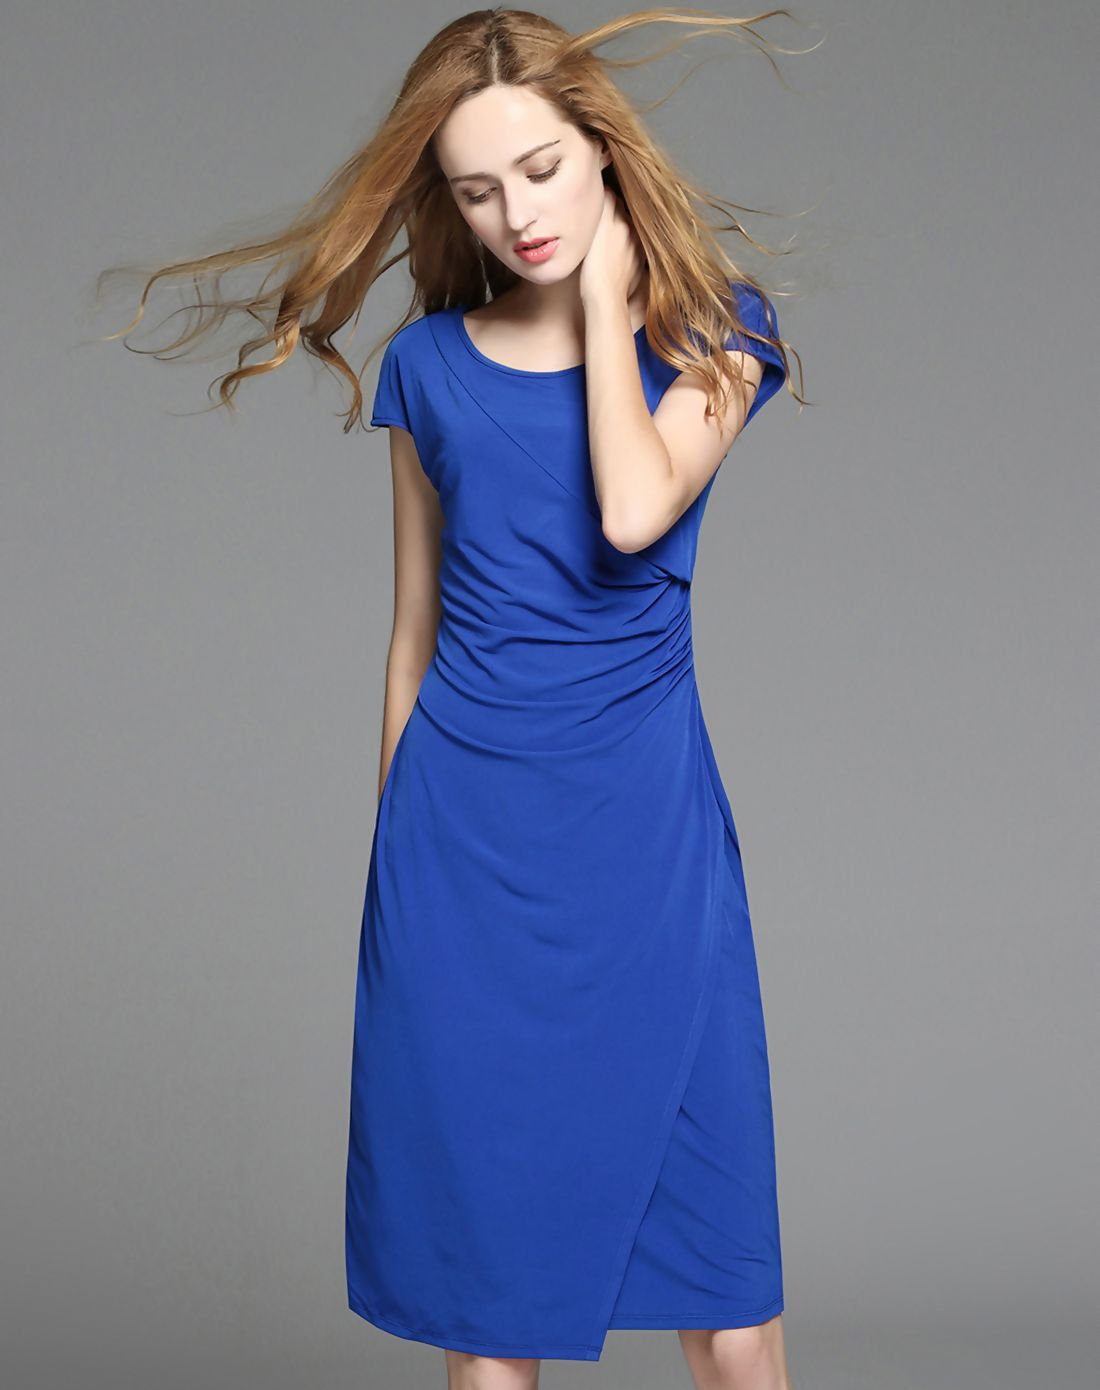 Adorewe vipme sheath dressesdesigner multiflora royal blue roma